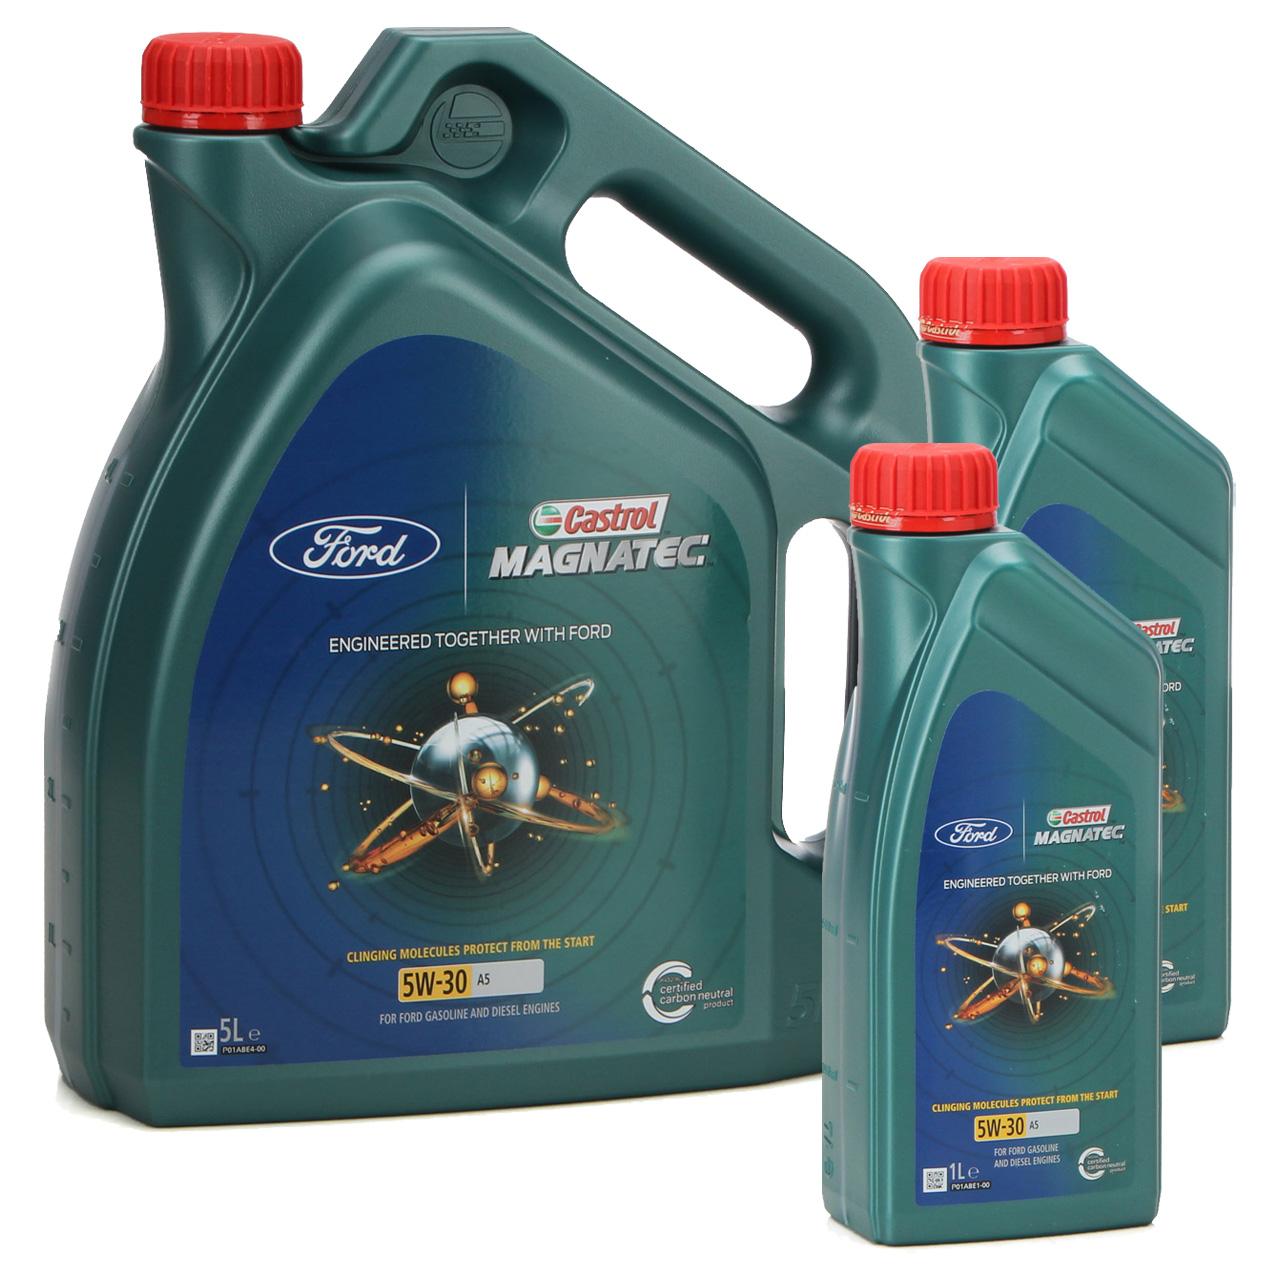 7L 7 Liter ORIGINAL Ford CASTROL Motoröl Öl MAGNATEC A5 5W30 5W-30